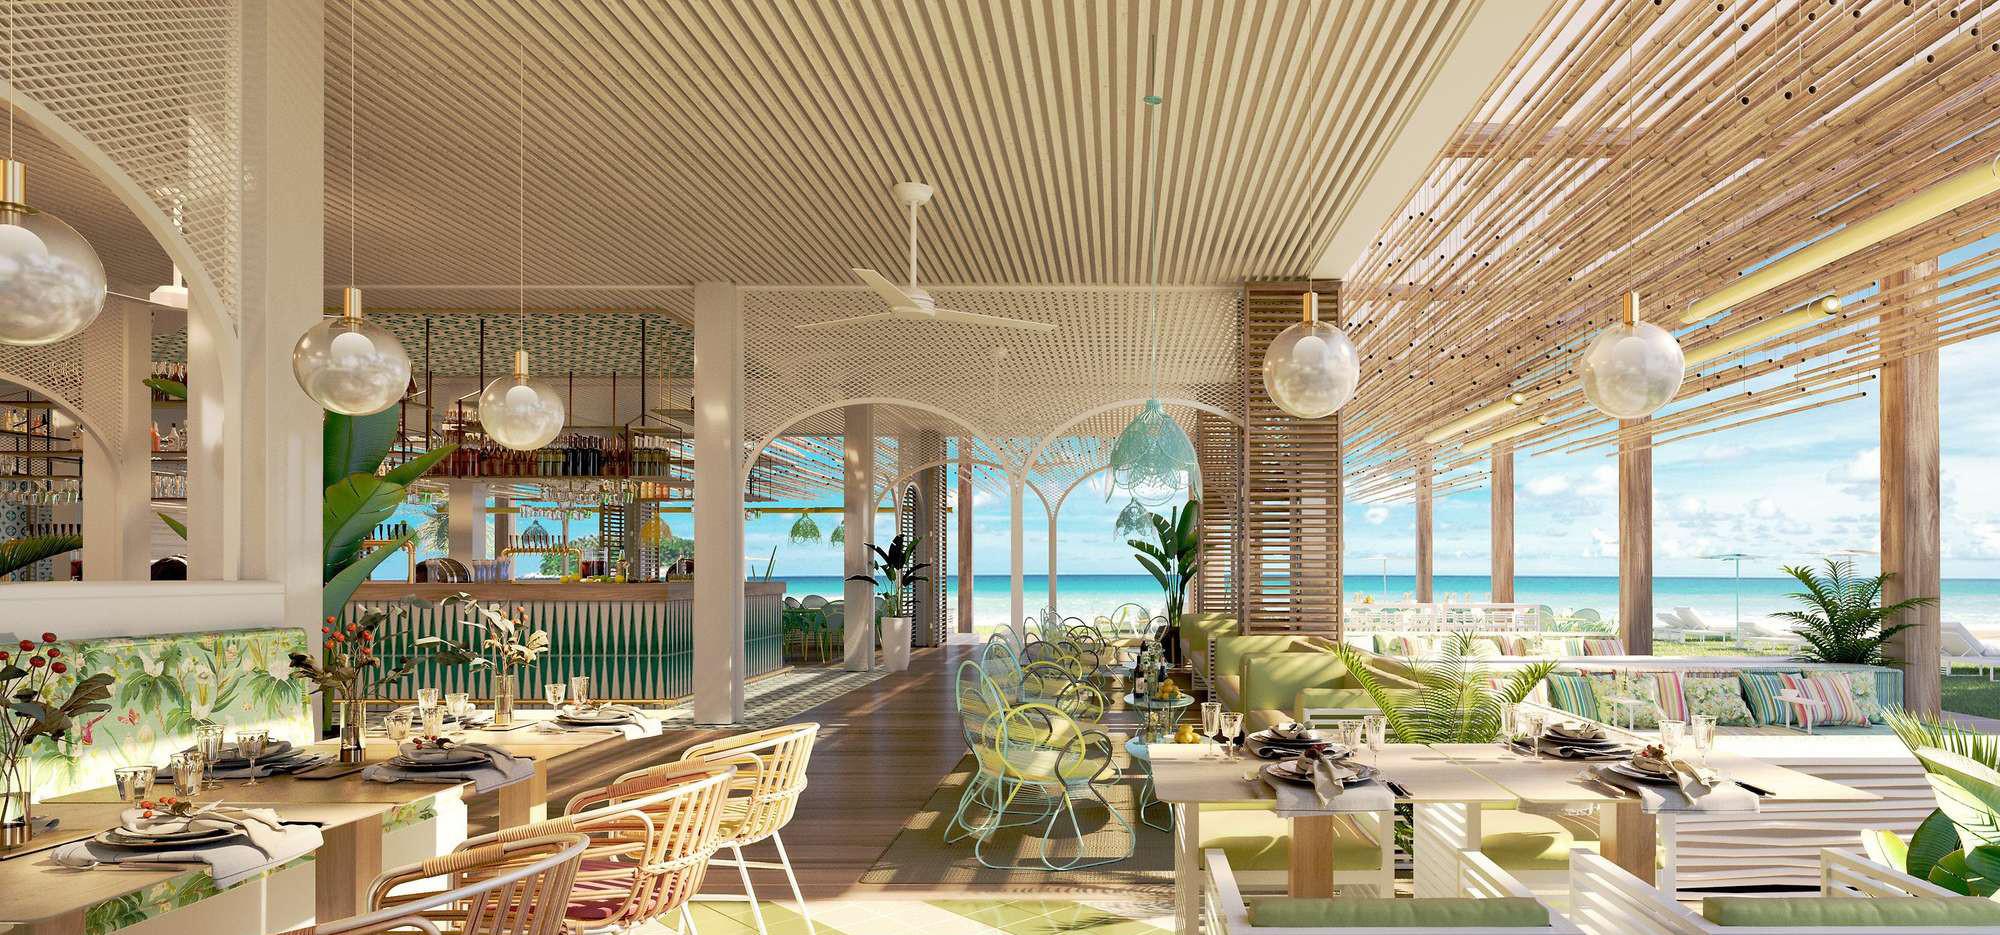 news-main-rediscover-the-caribbean-at-club-med-miches-playa-esmeralda.1554313836.jpg